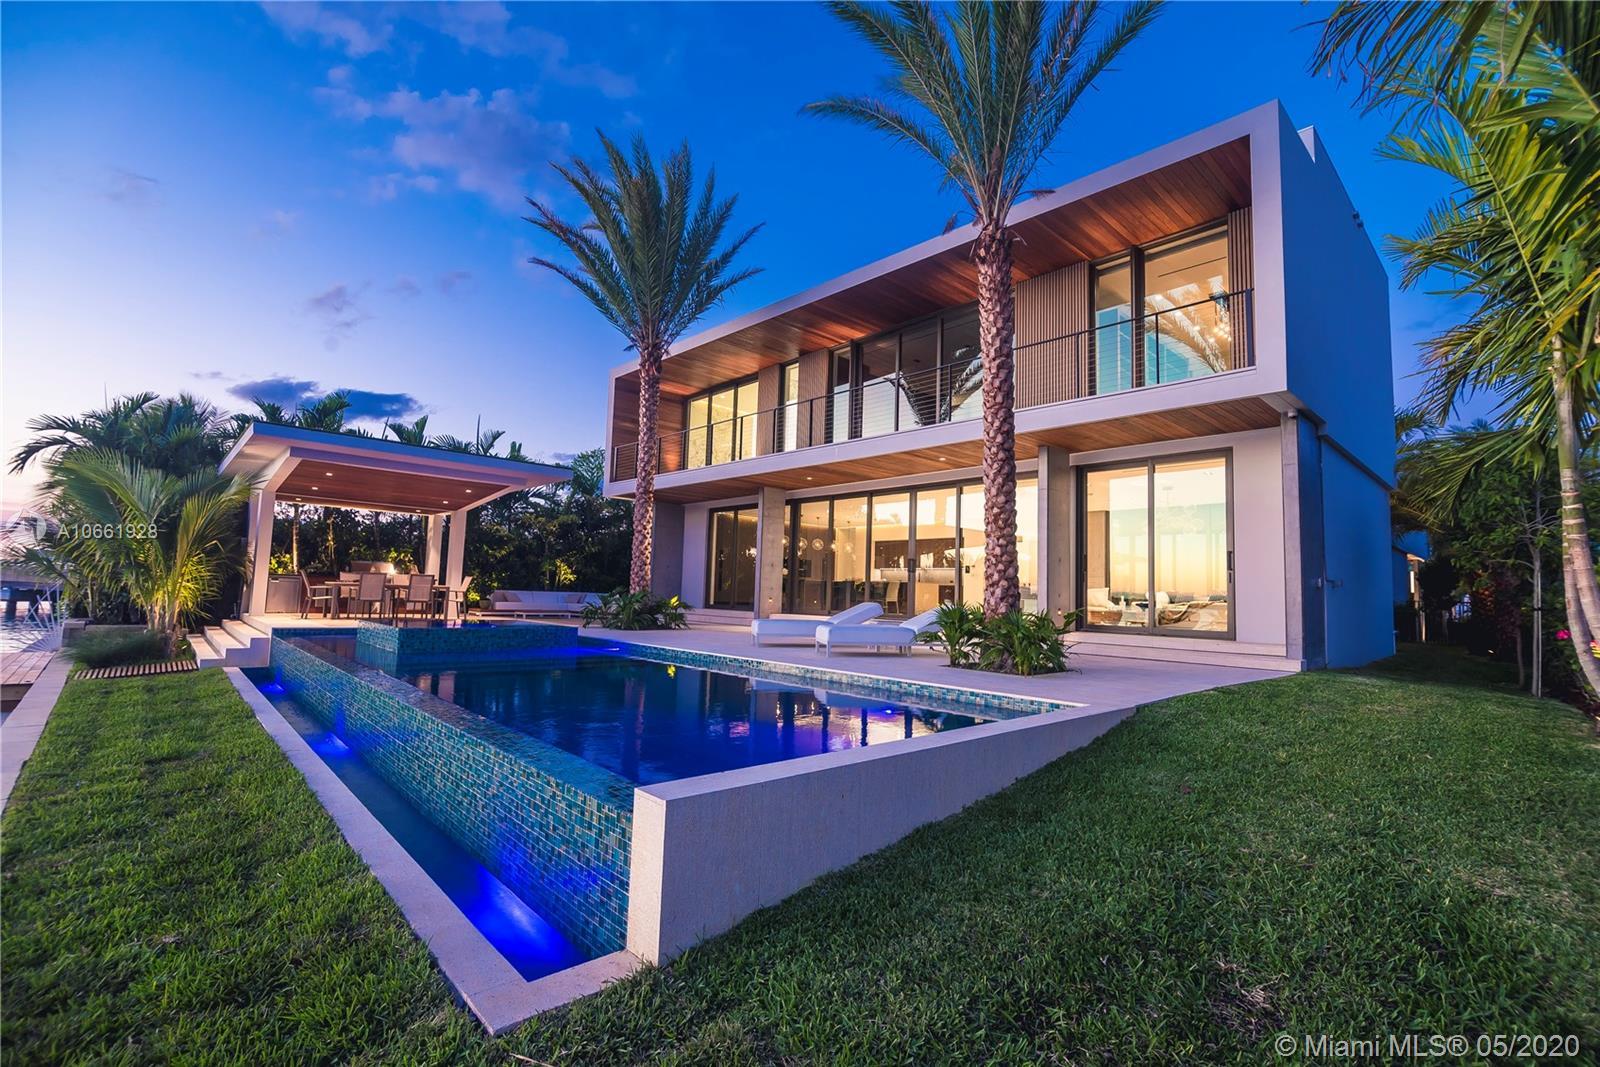 9540 W Broadview Dr, Bay Harbor Islands, FL 33154 - Bay Harbor Islands, FL real estate listing